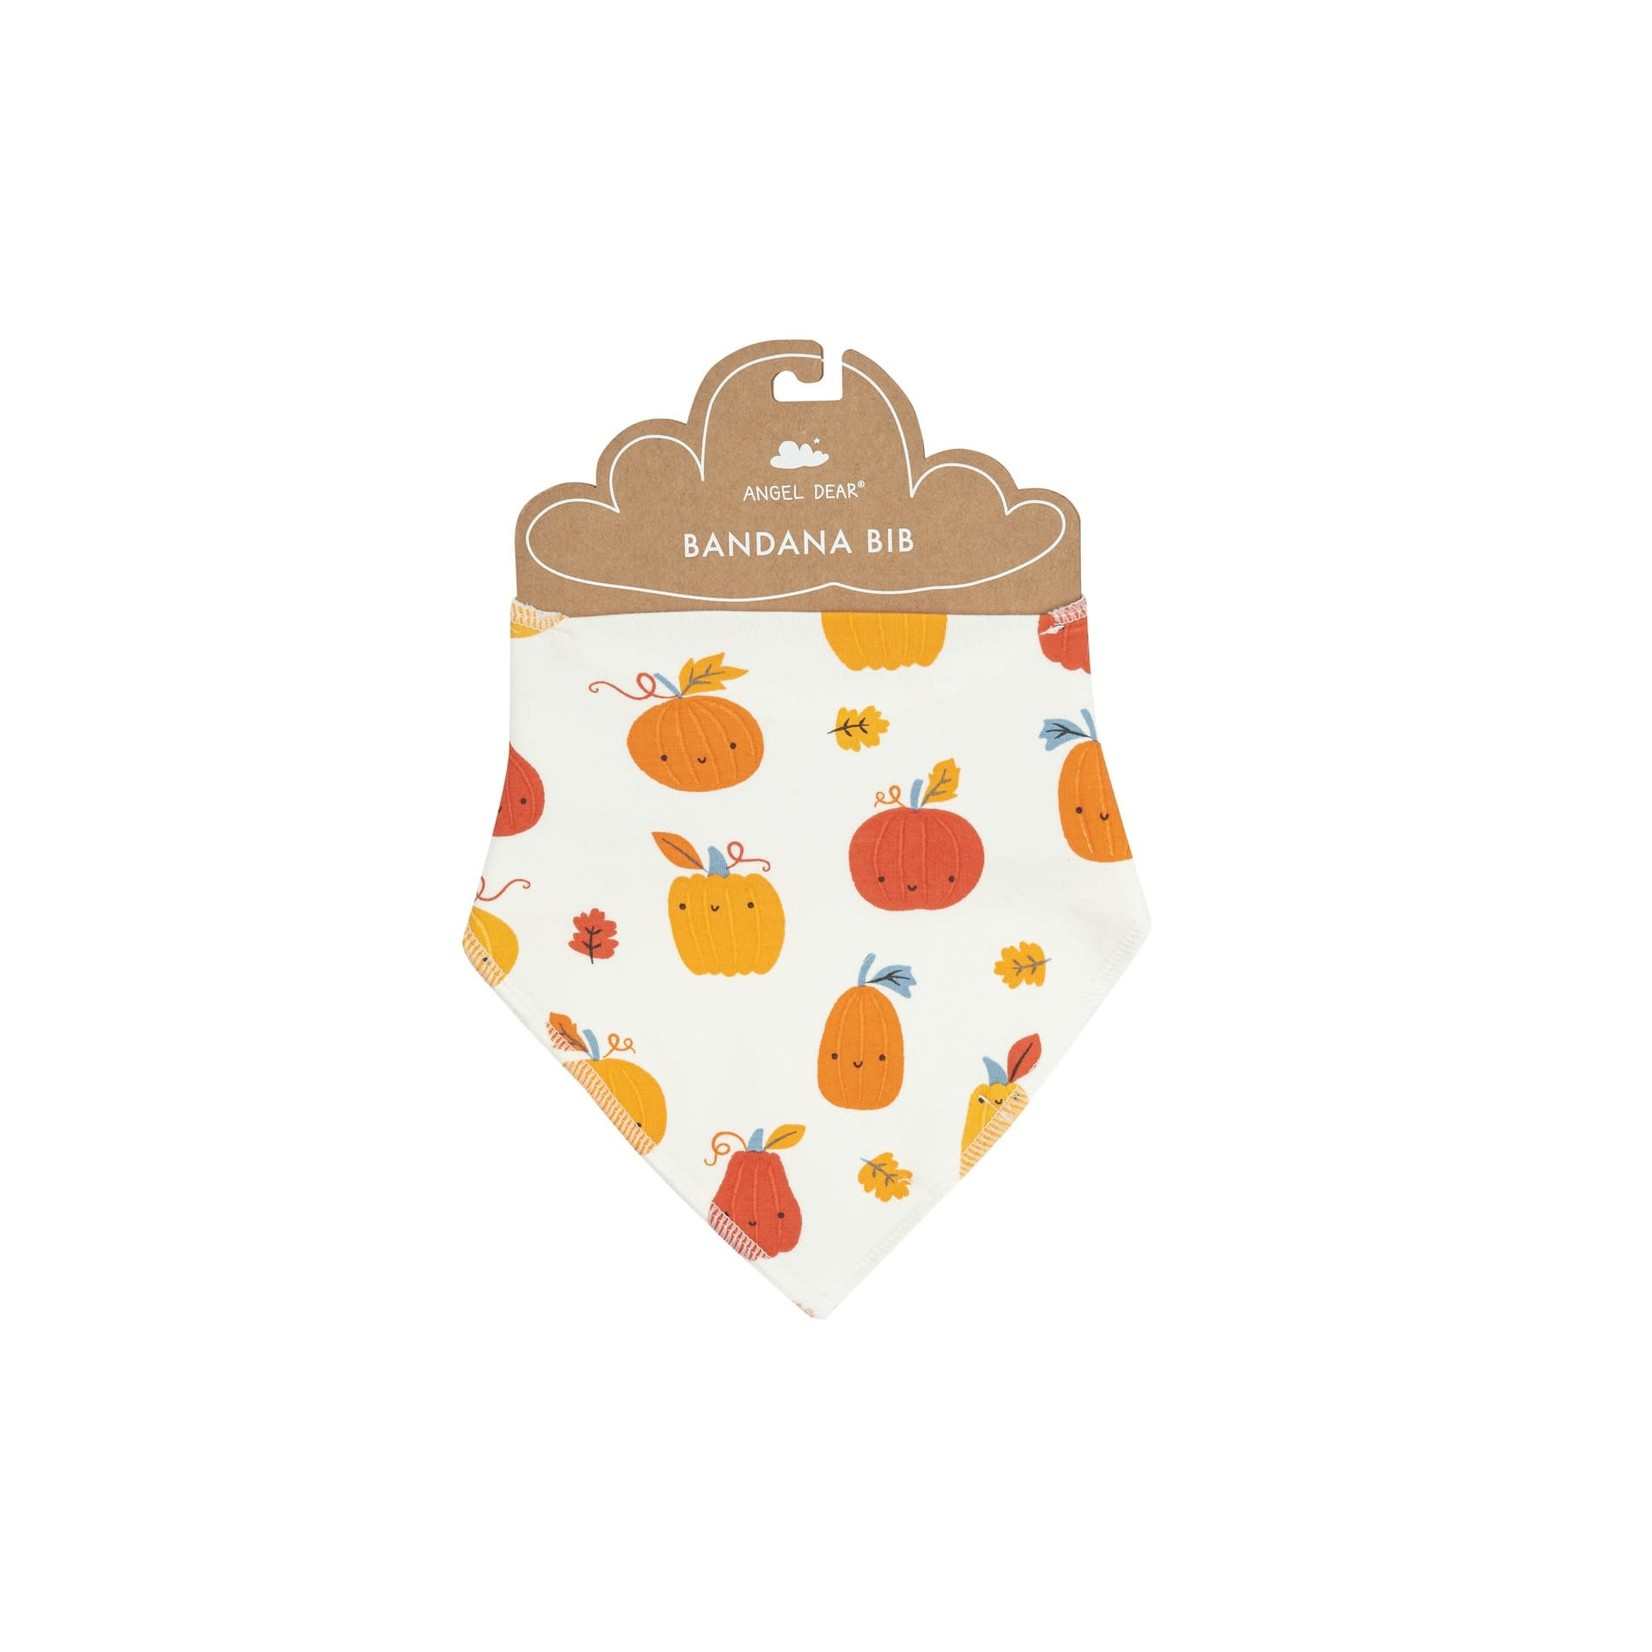 Angel Dear Bandana Bib, Pumpkin Patch